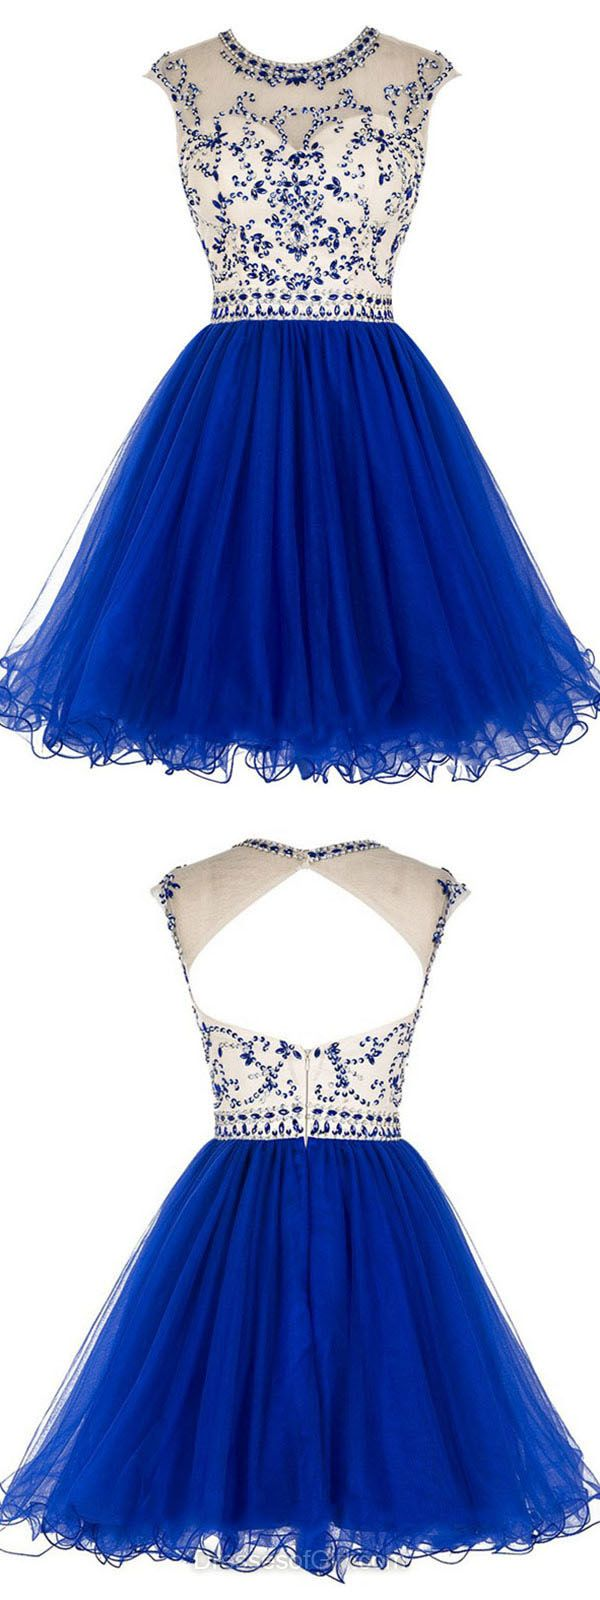 266 best Dress to impress images on Pinterest | Ballkleider ...